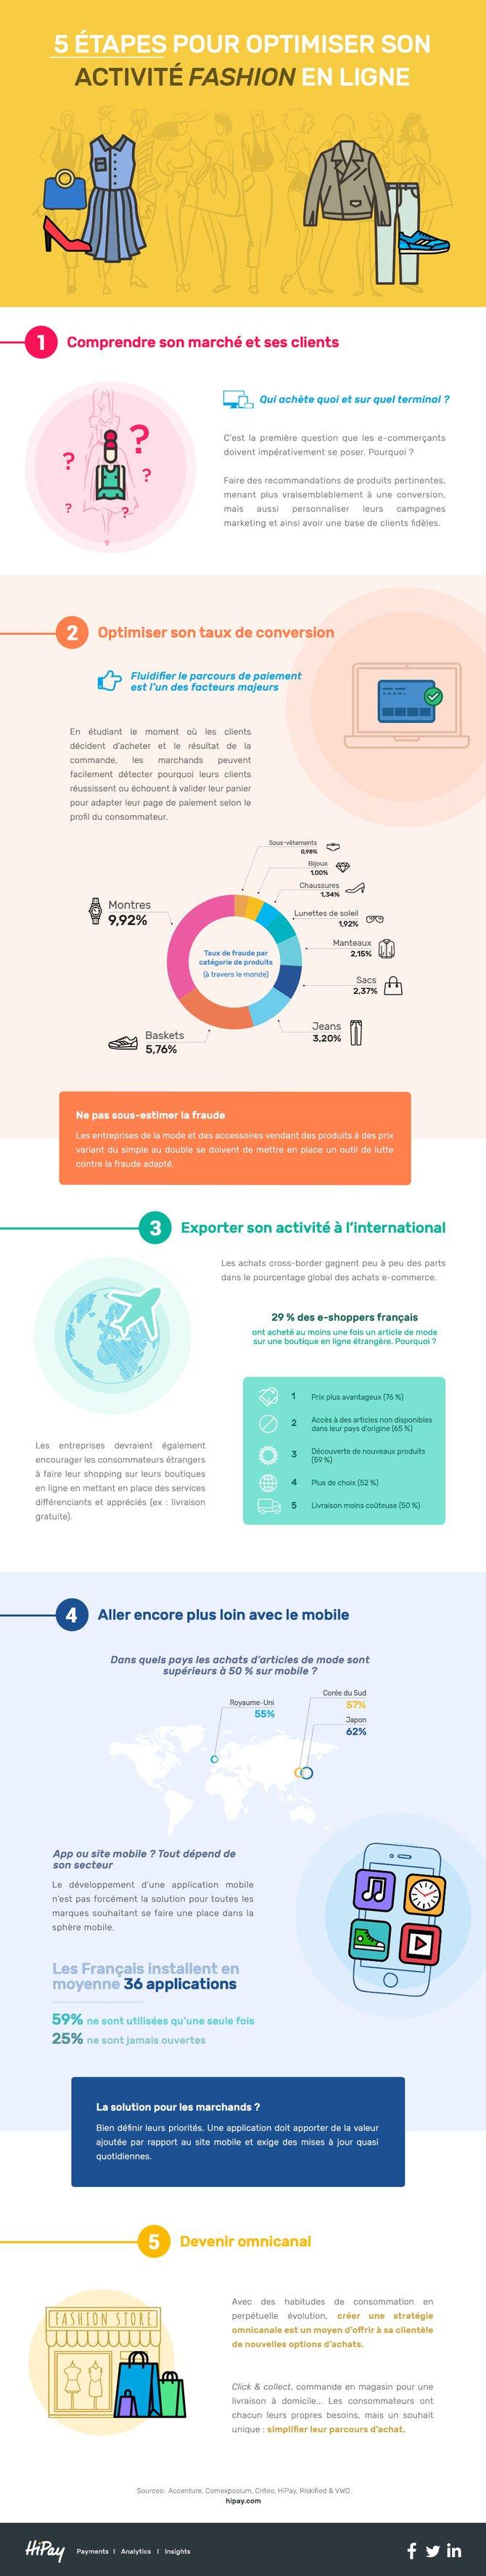 infographie-fashion.jpg